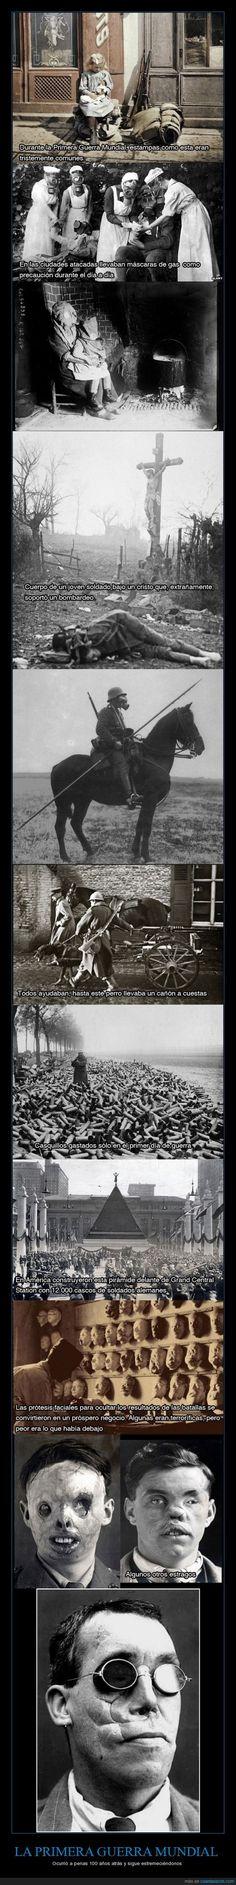 4 Eso World War I